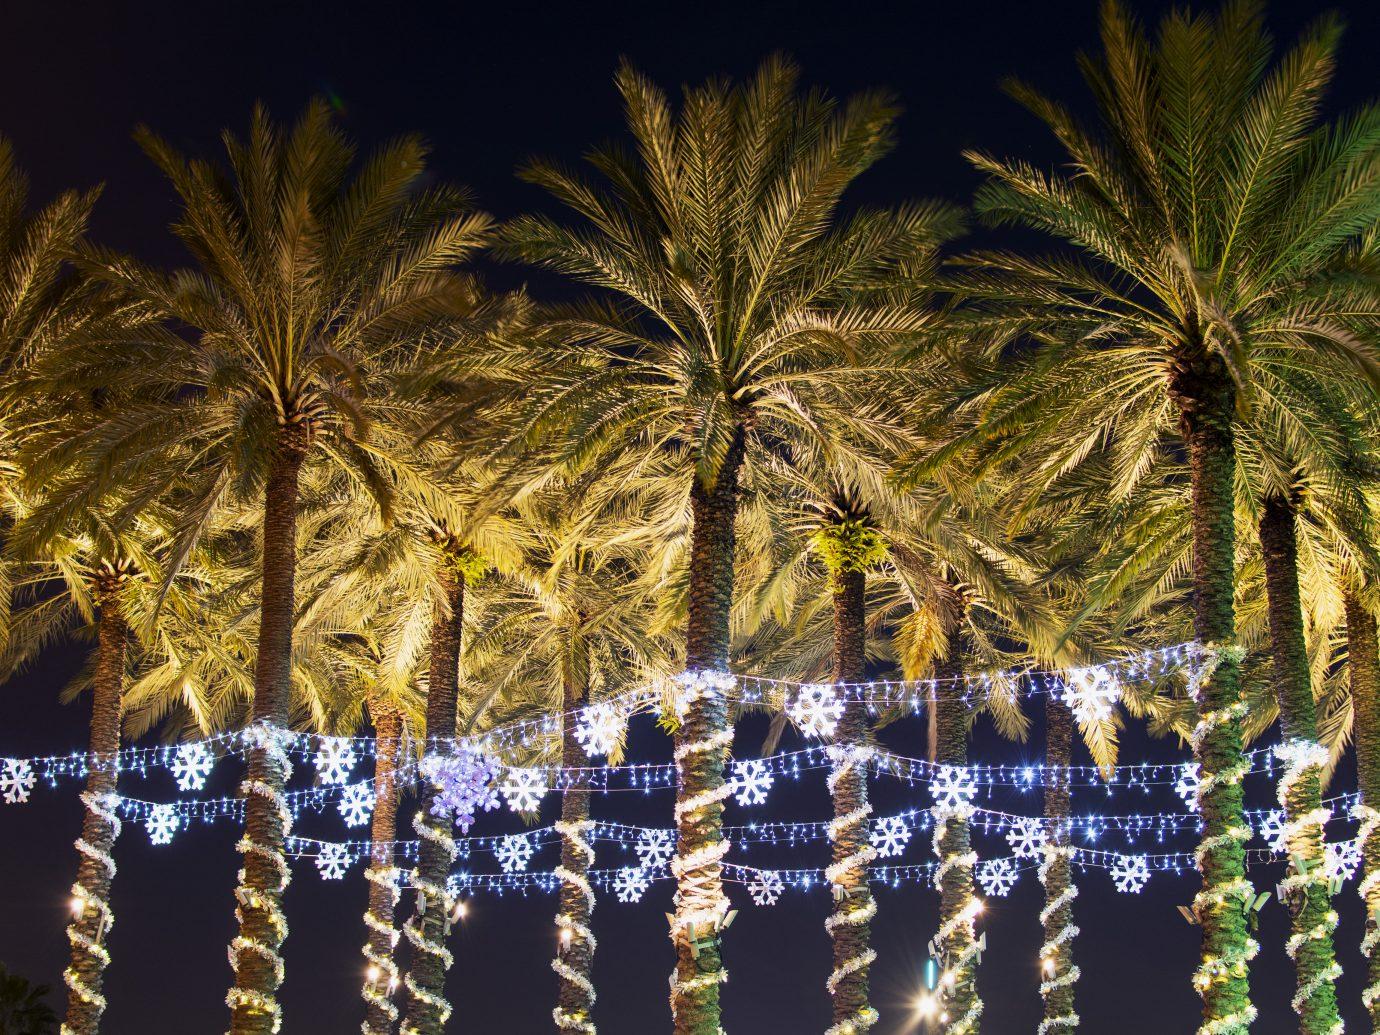 Christmas holiday illumination on palm trees in Florida.